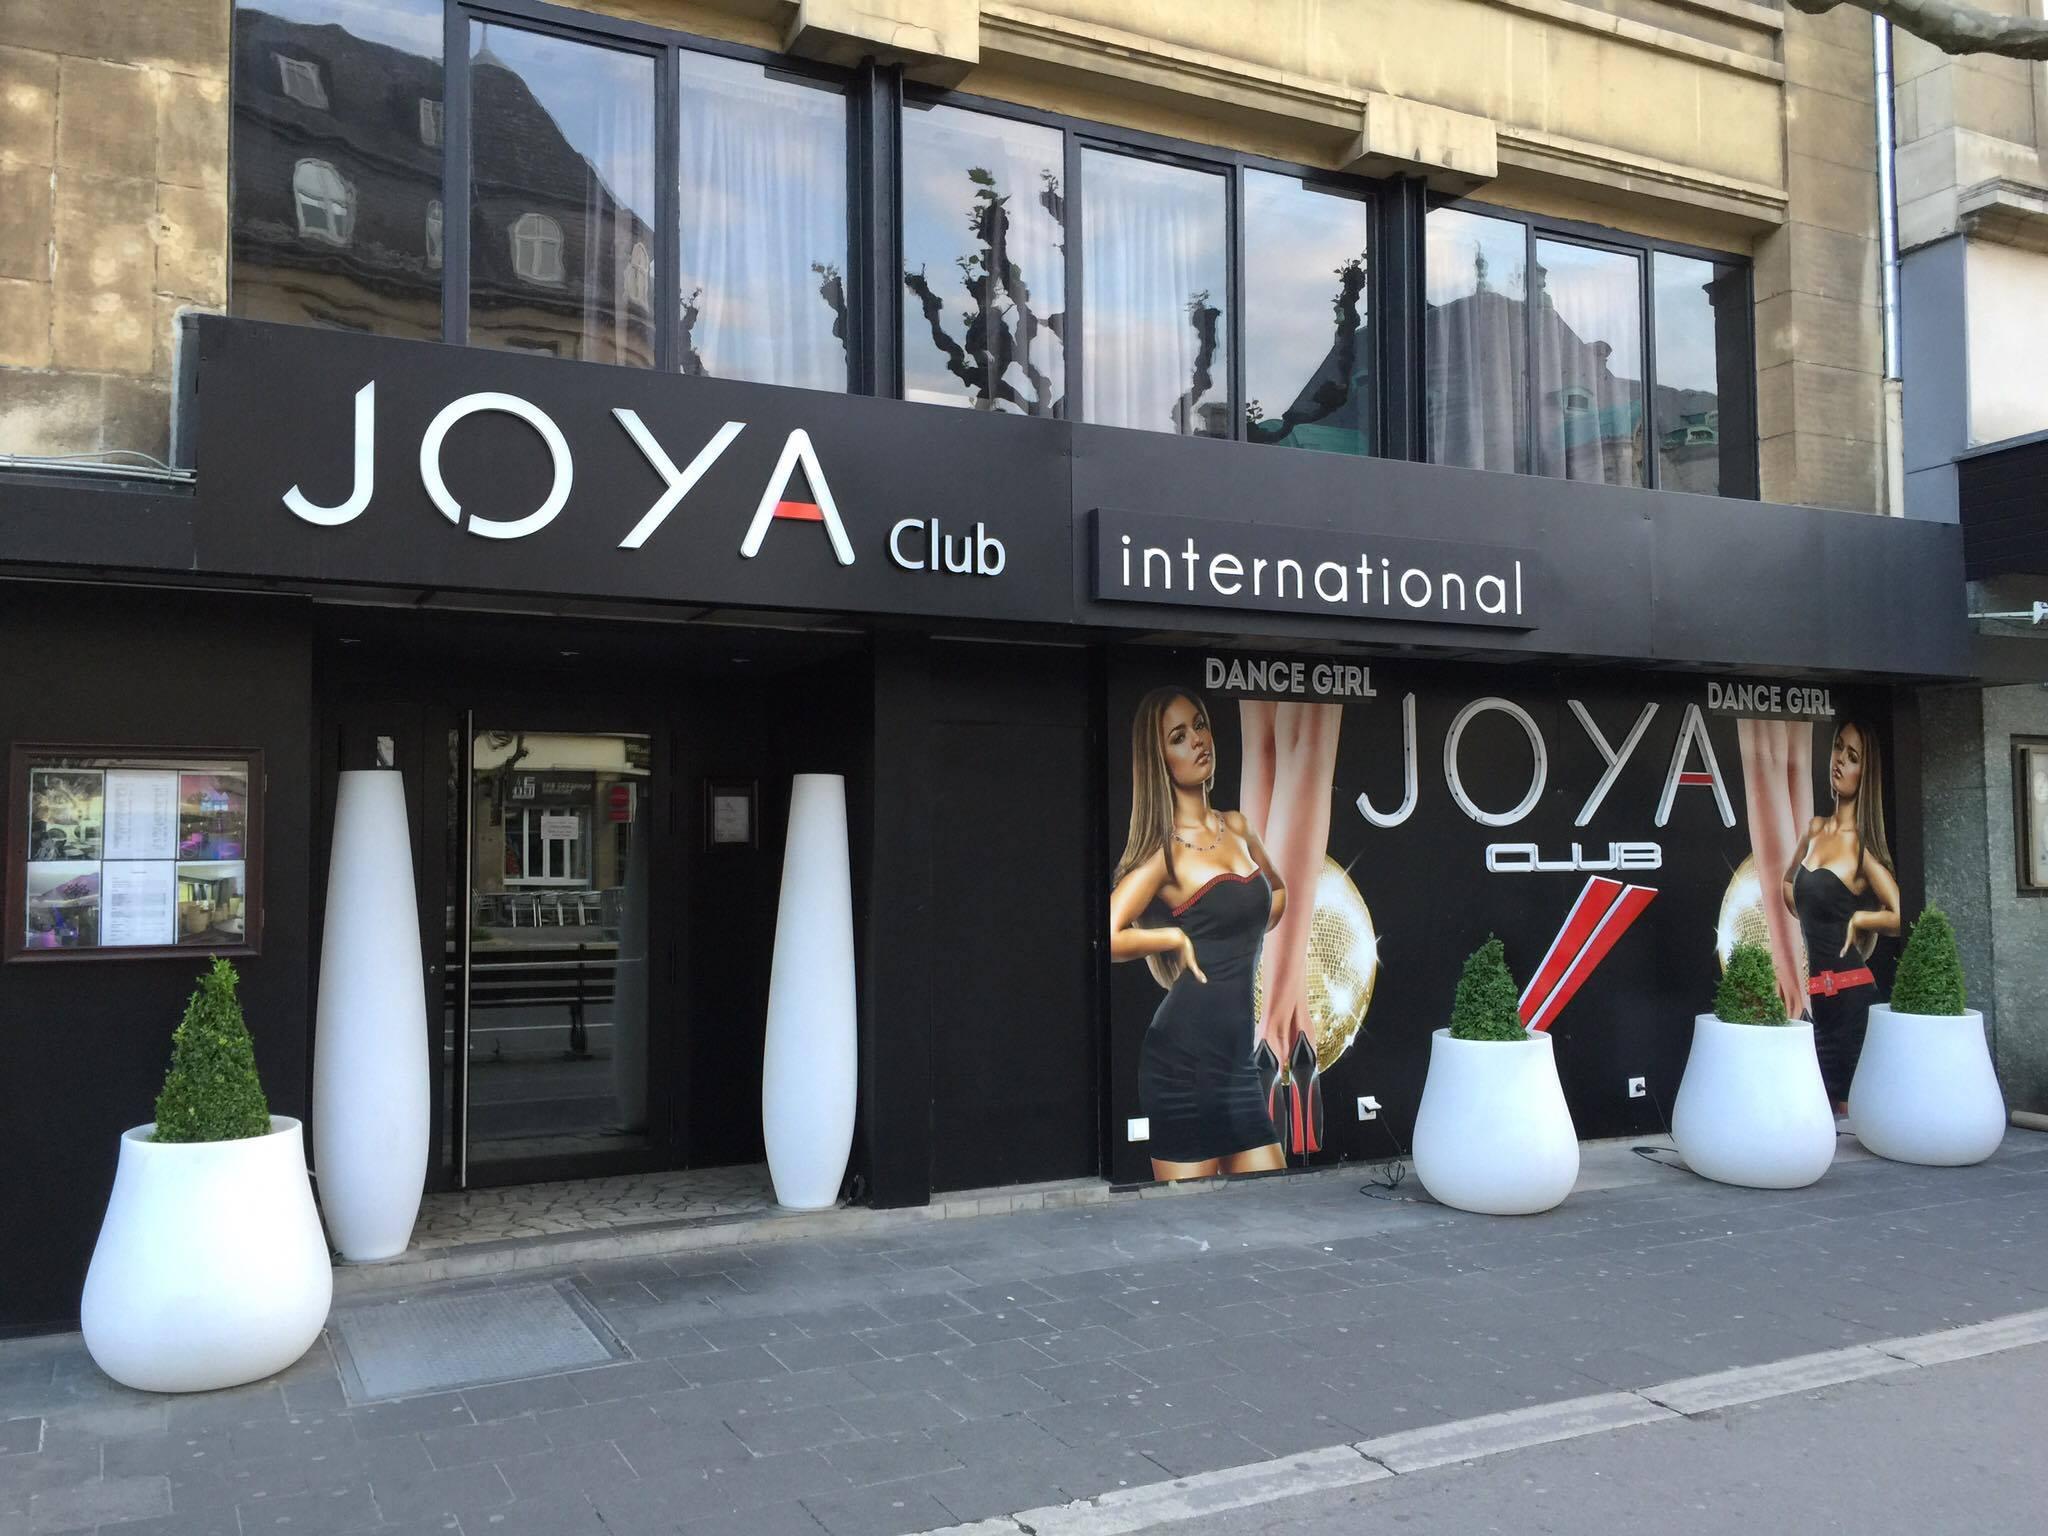 JOYA international club